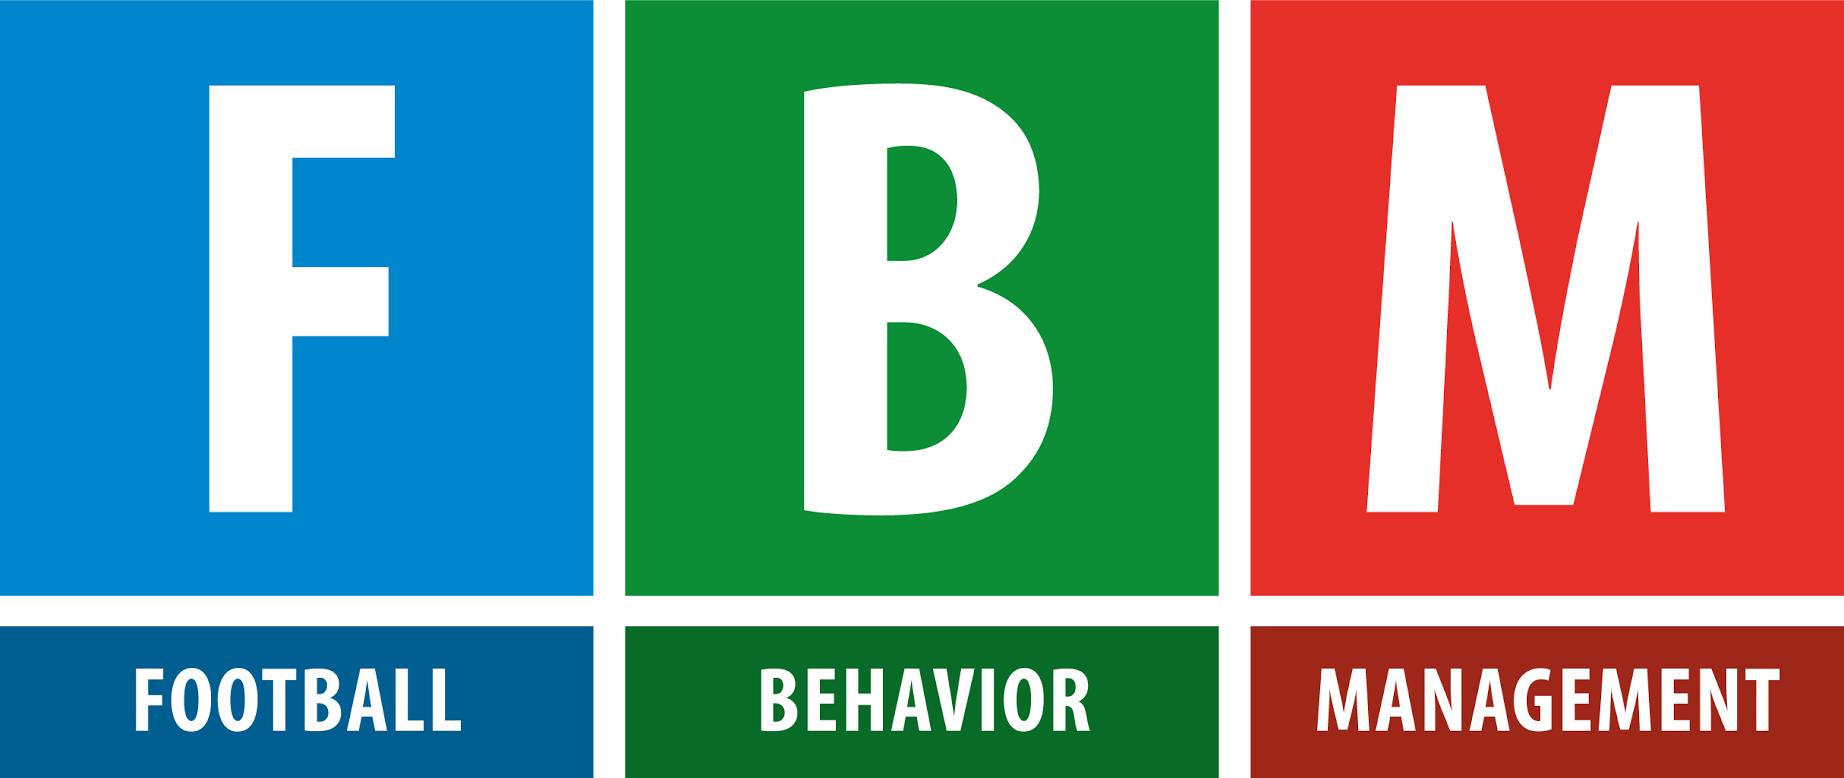 Football Behavior Management